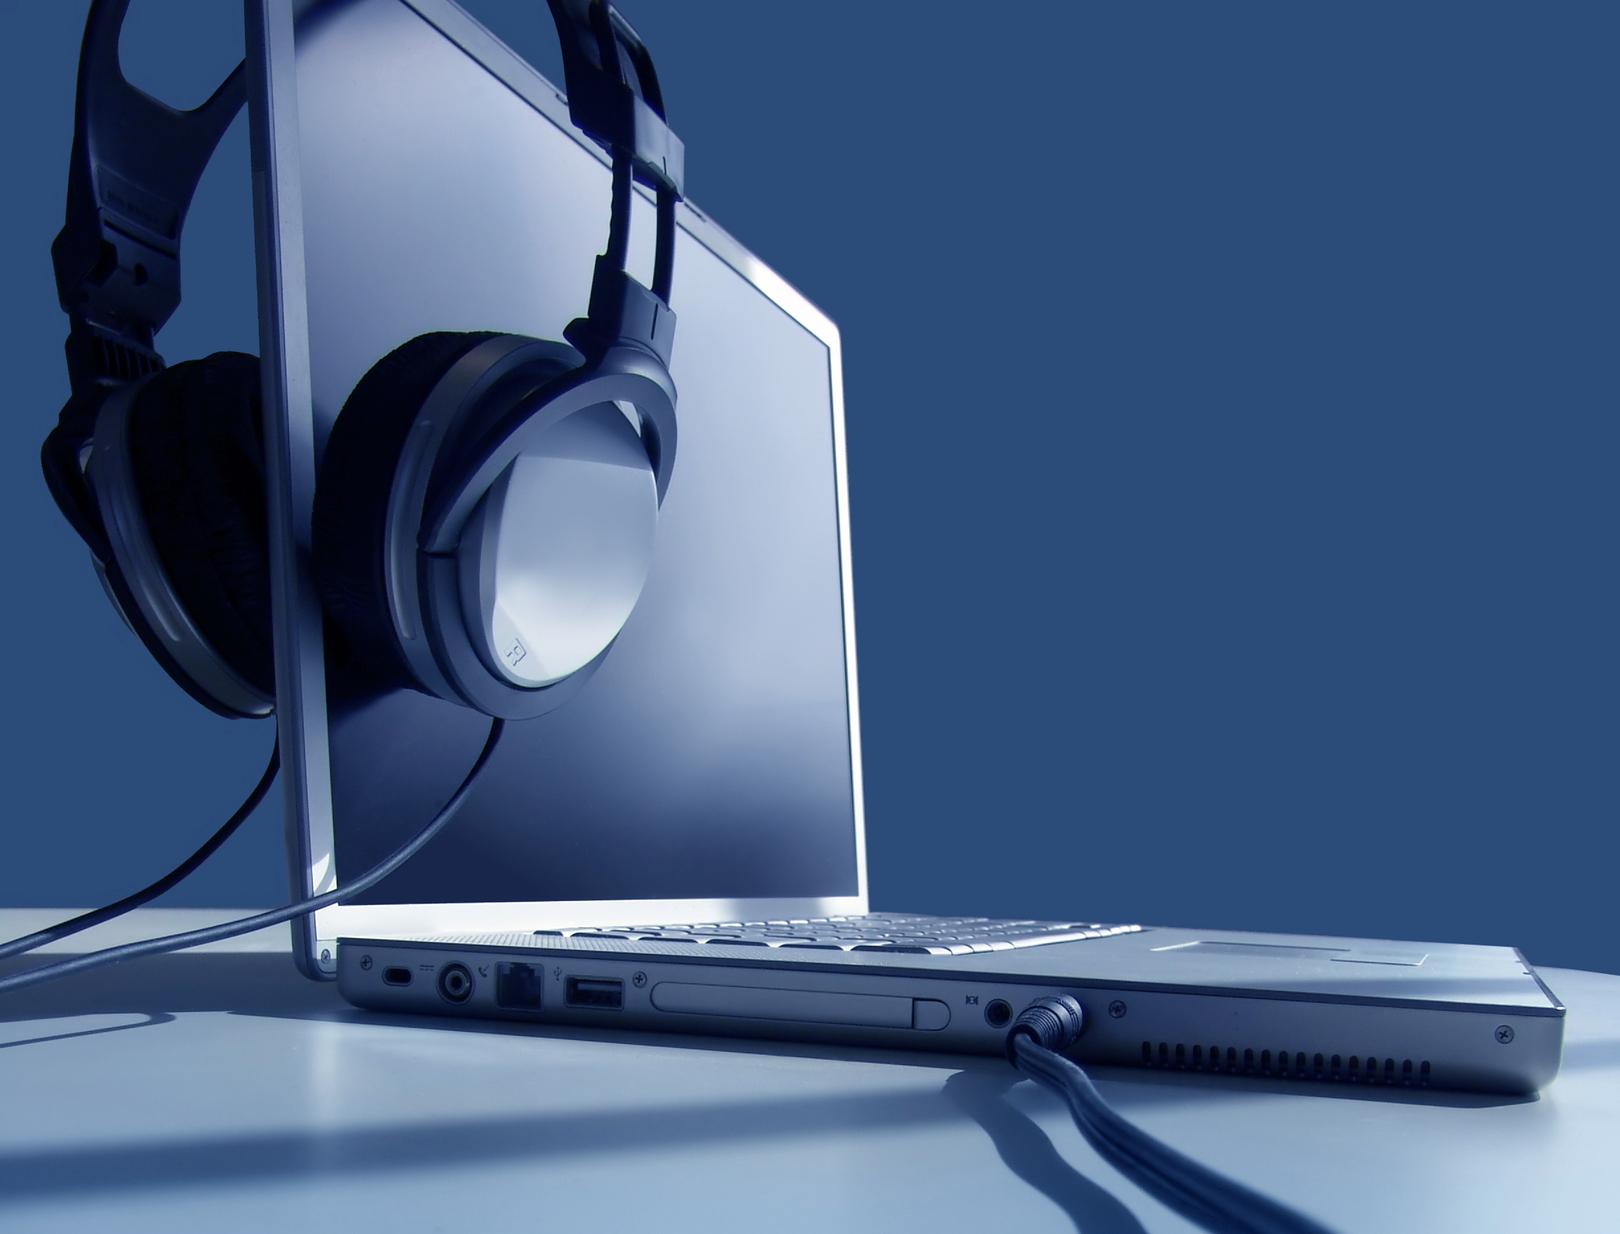 мет 24 знакомства онлайн для ноутбука